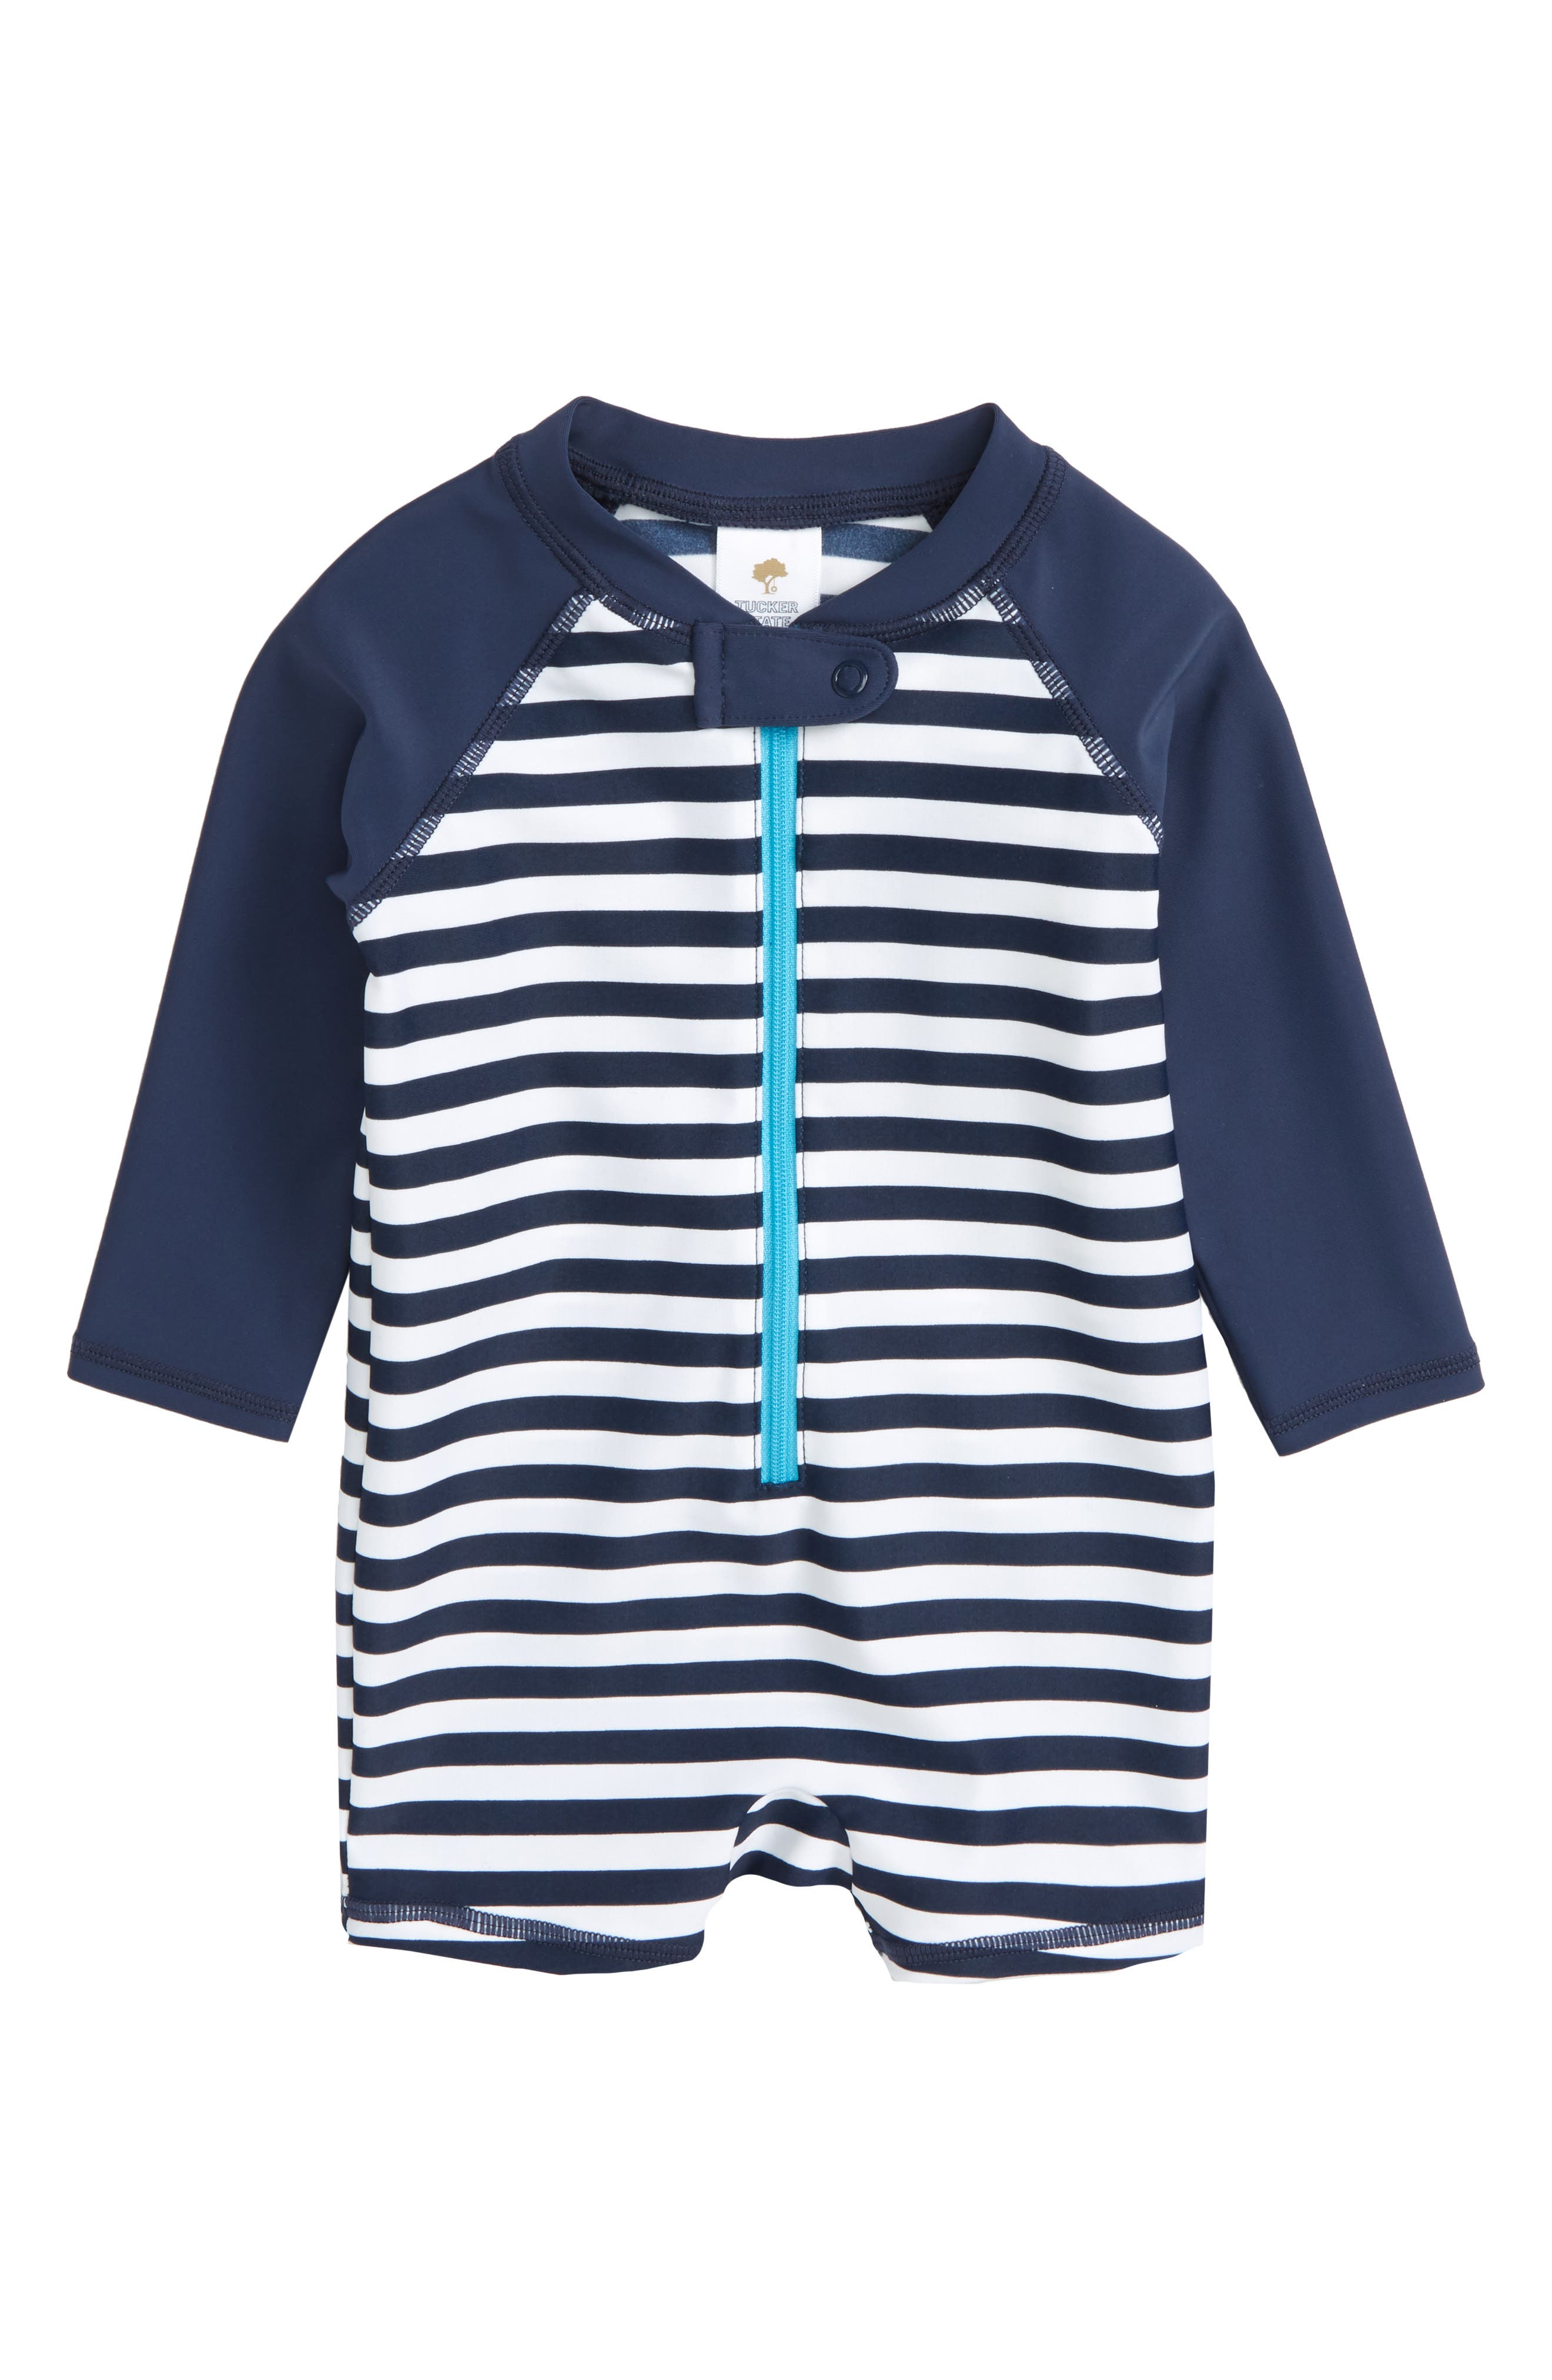 Tucker + Tate One-Piece Rashguard Swimsuit (Baby Boys)